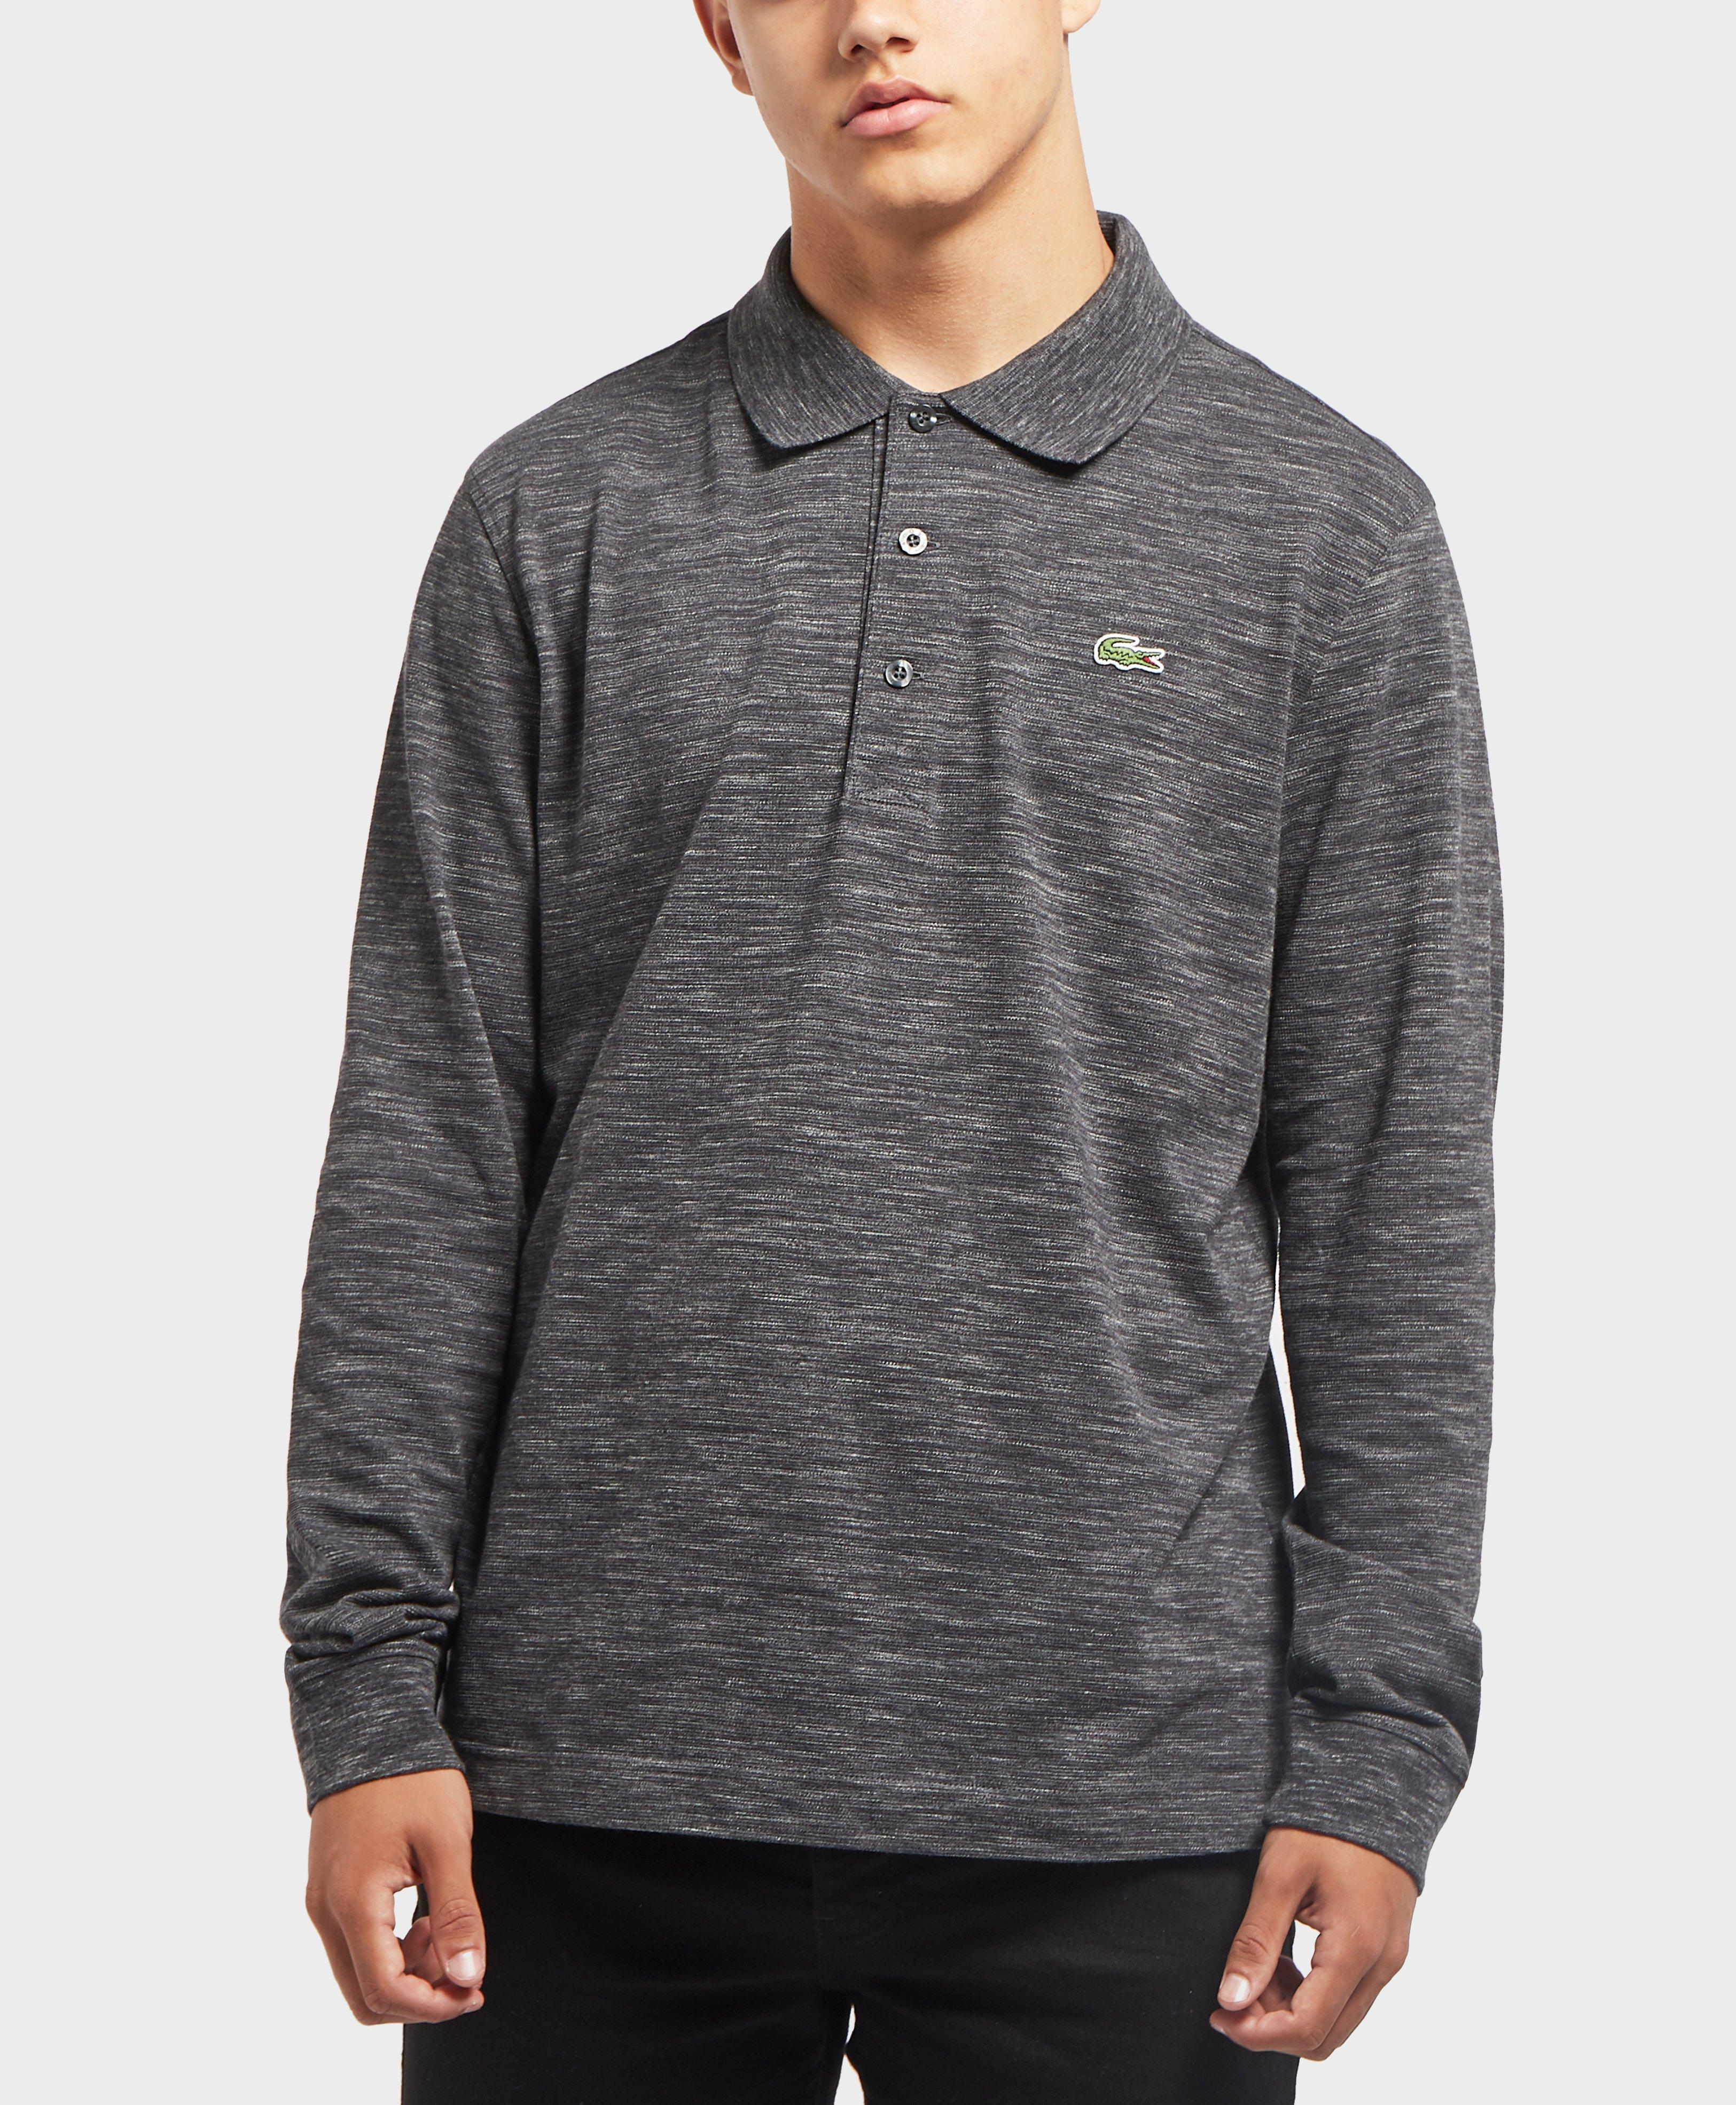 d974d51d Lacoste Alligator Long Sleeve Polo Shirt in Gray for Men - Lyst